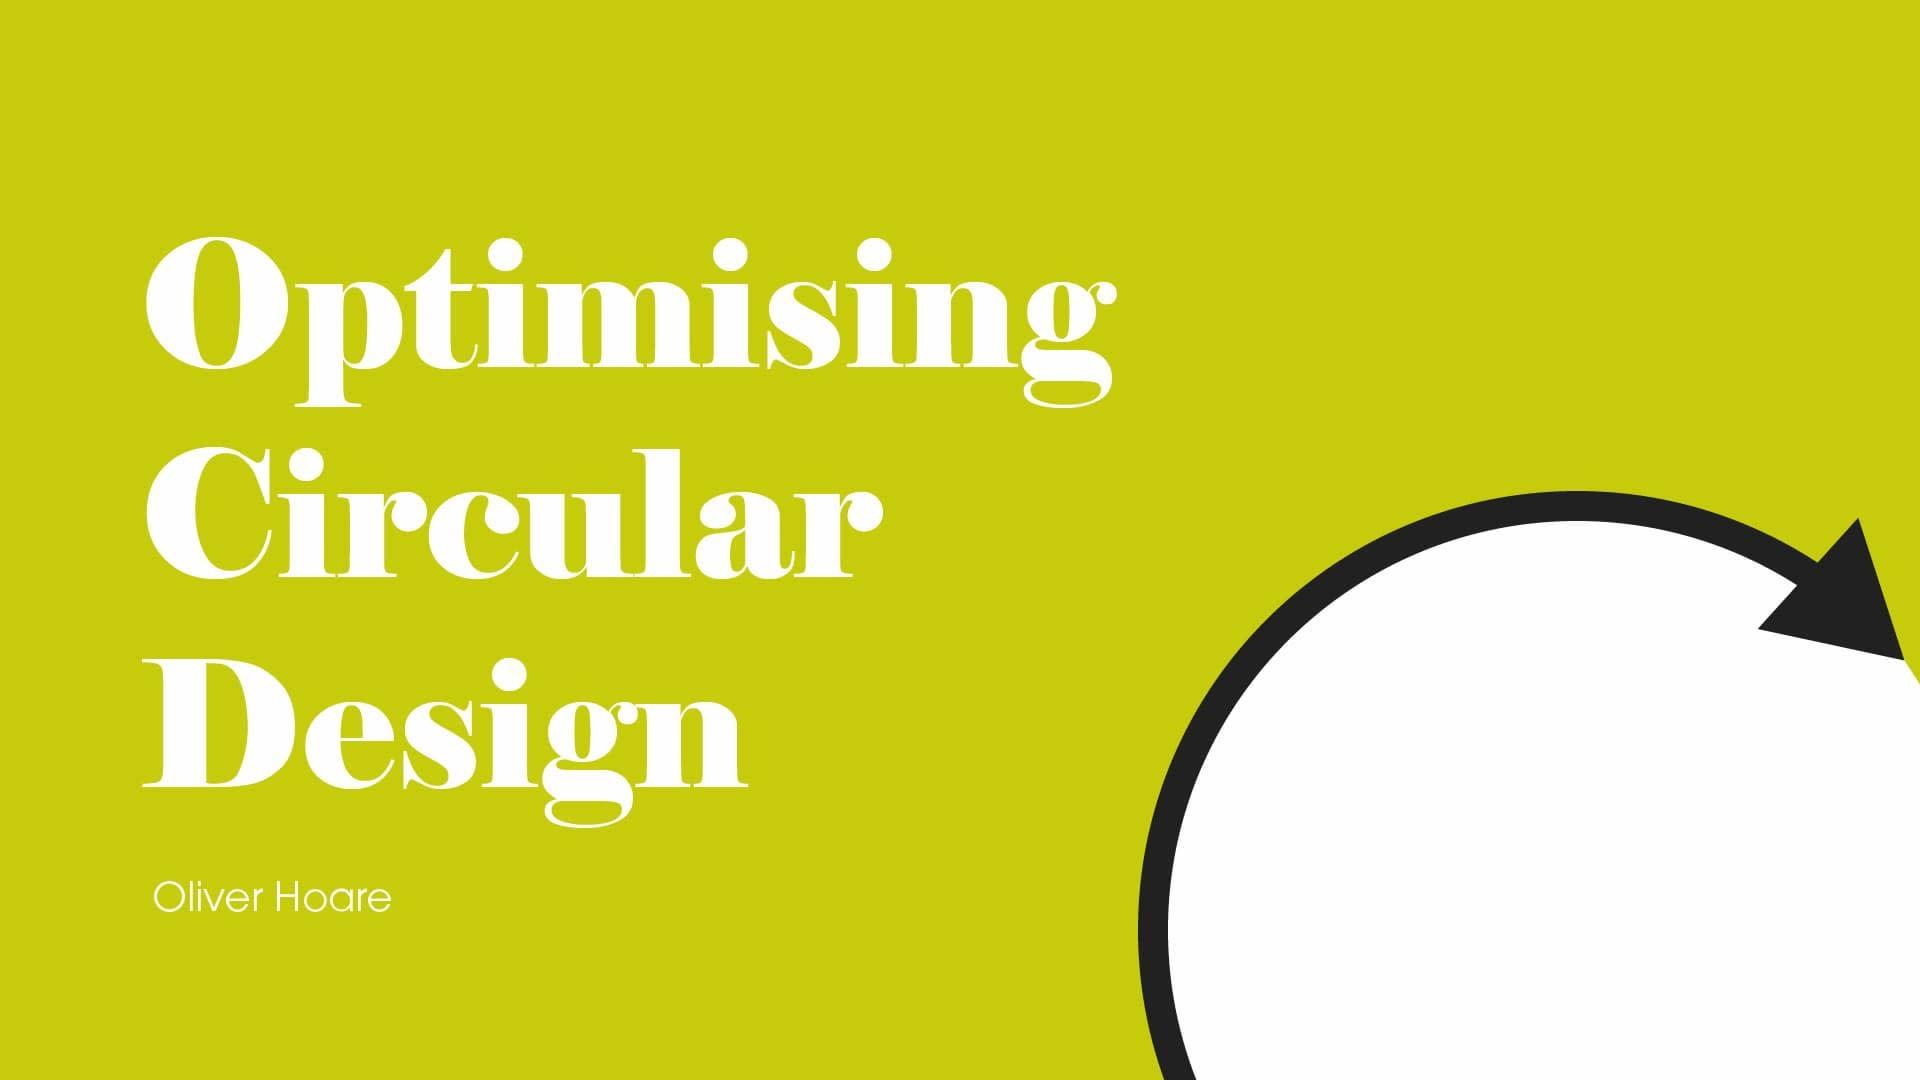 — Optimising Circular Design